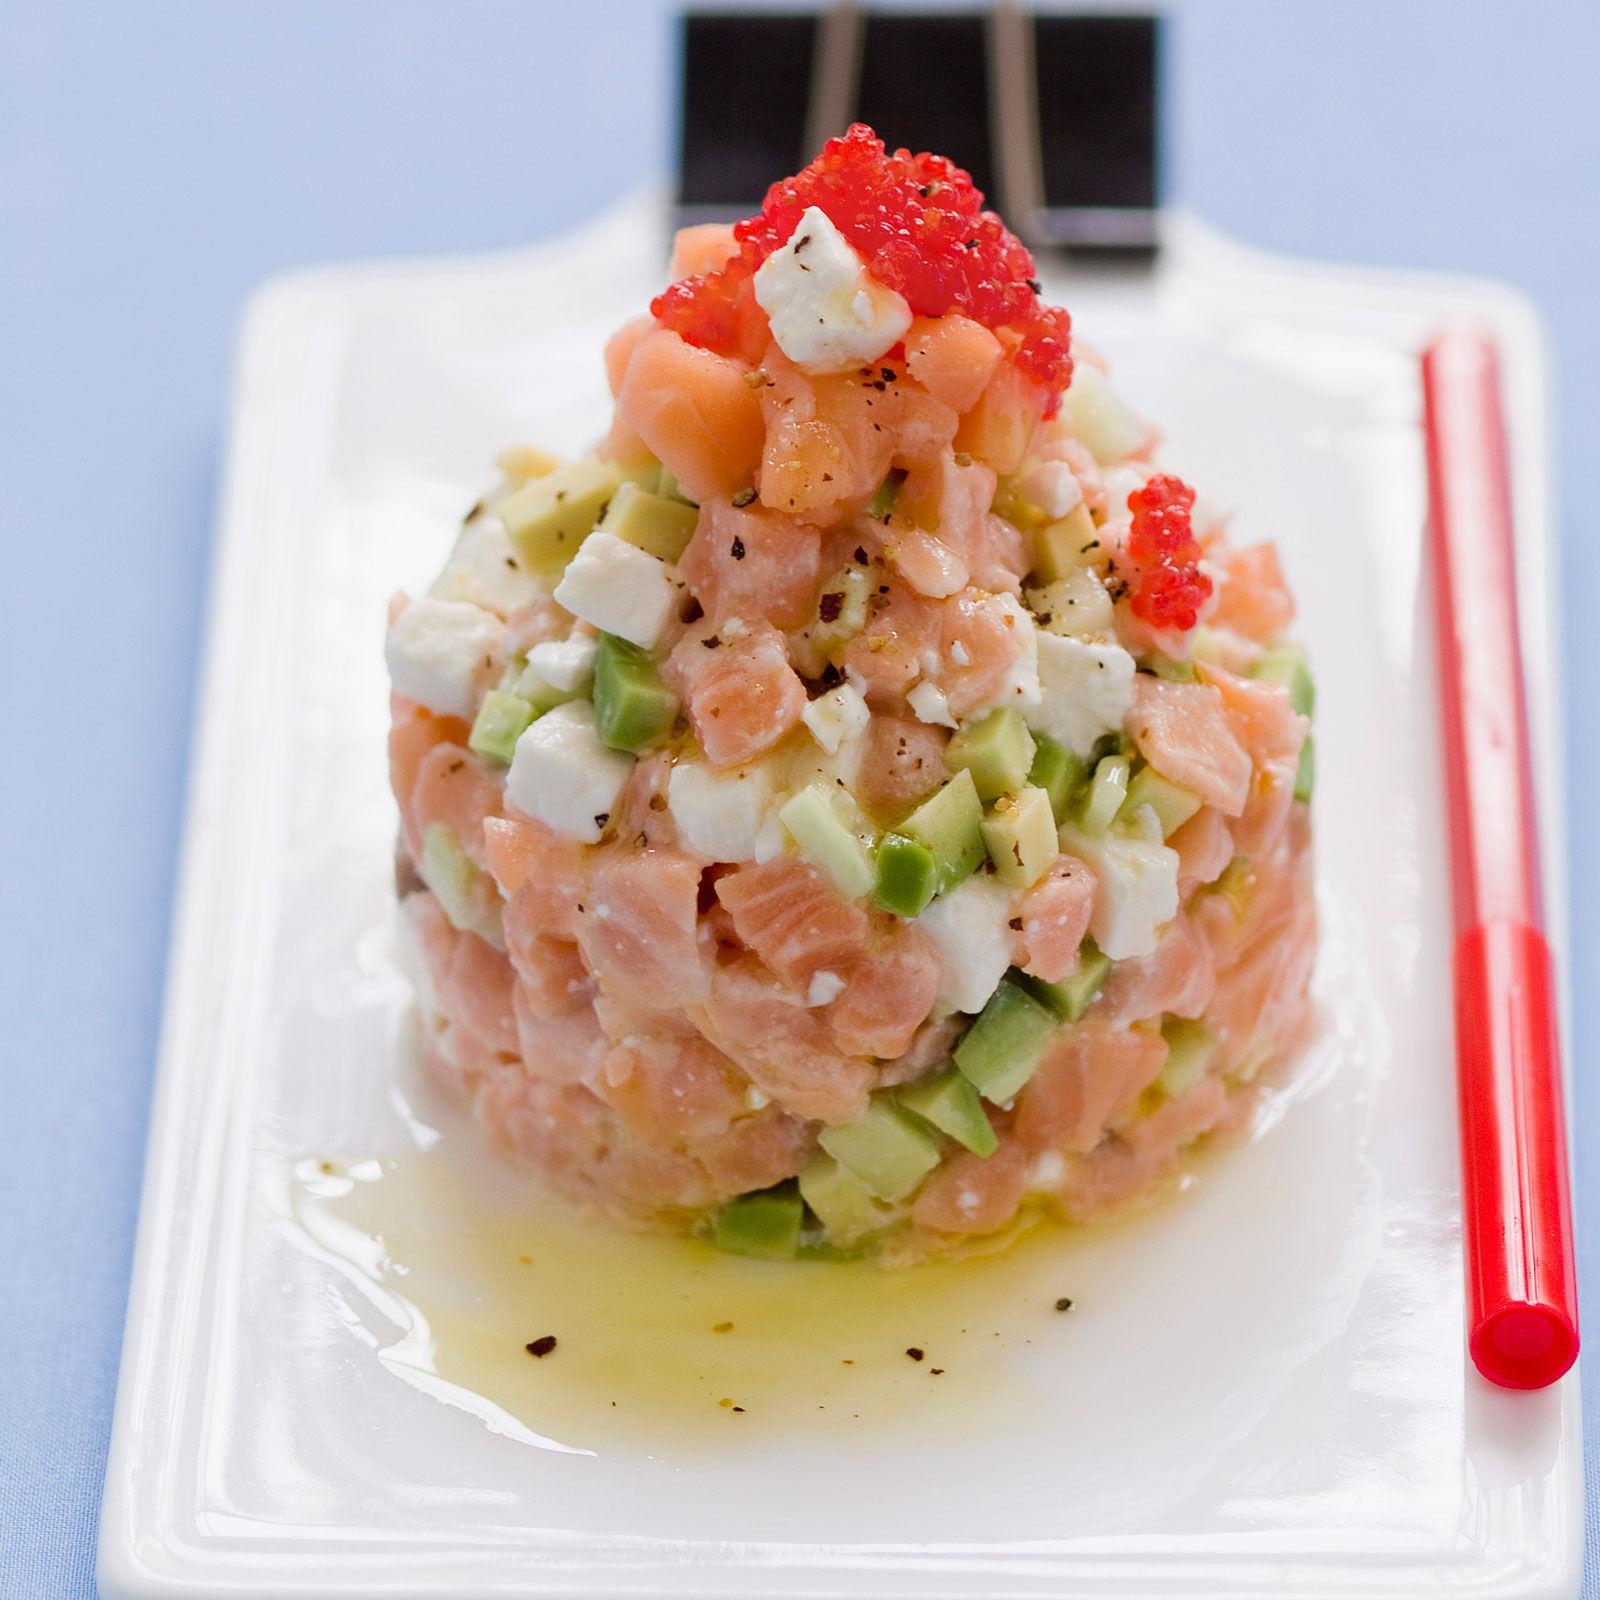 Recette minceur tartare de saumon